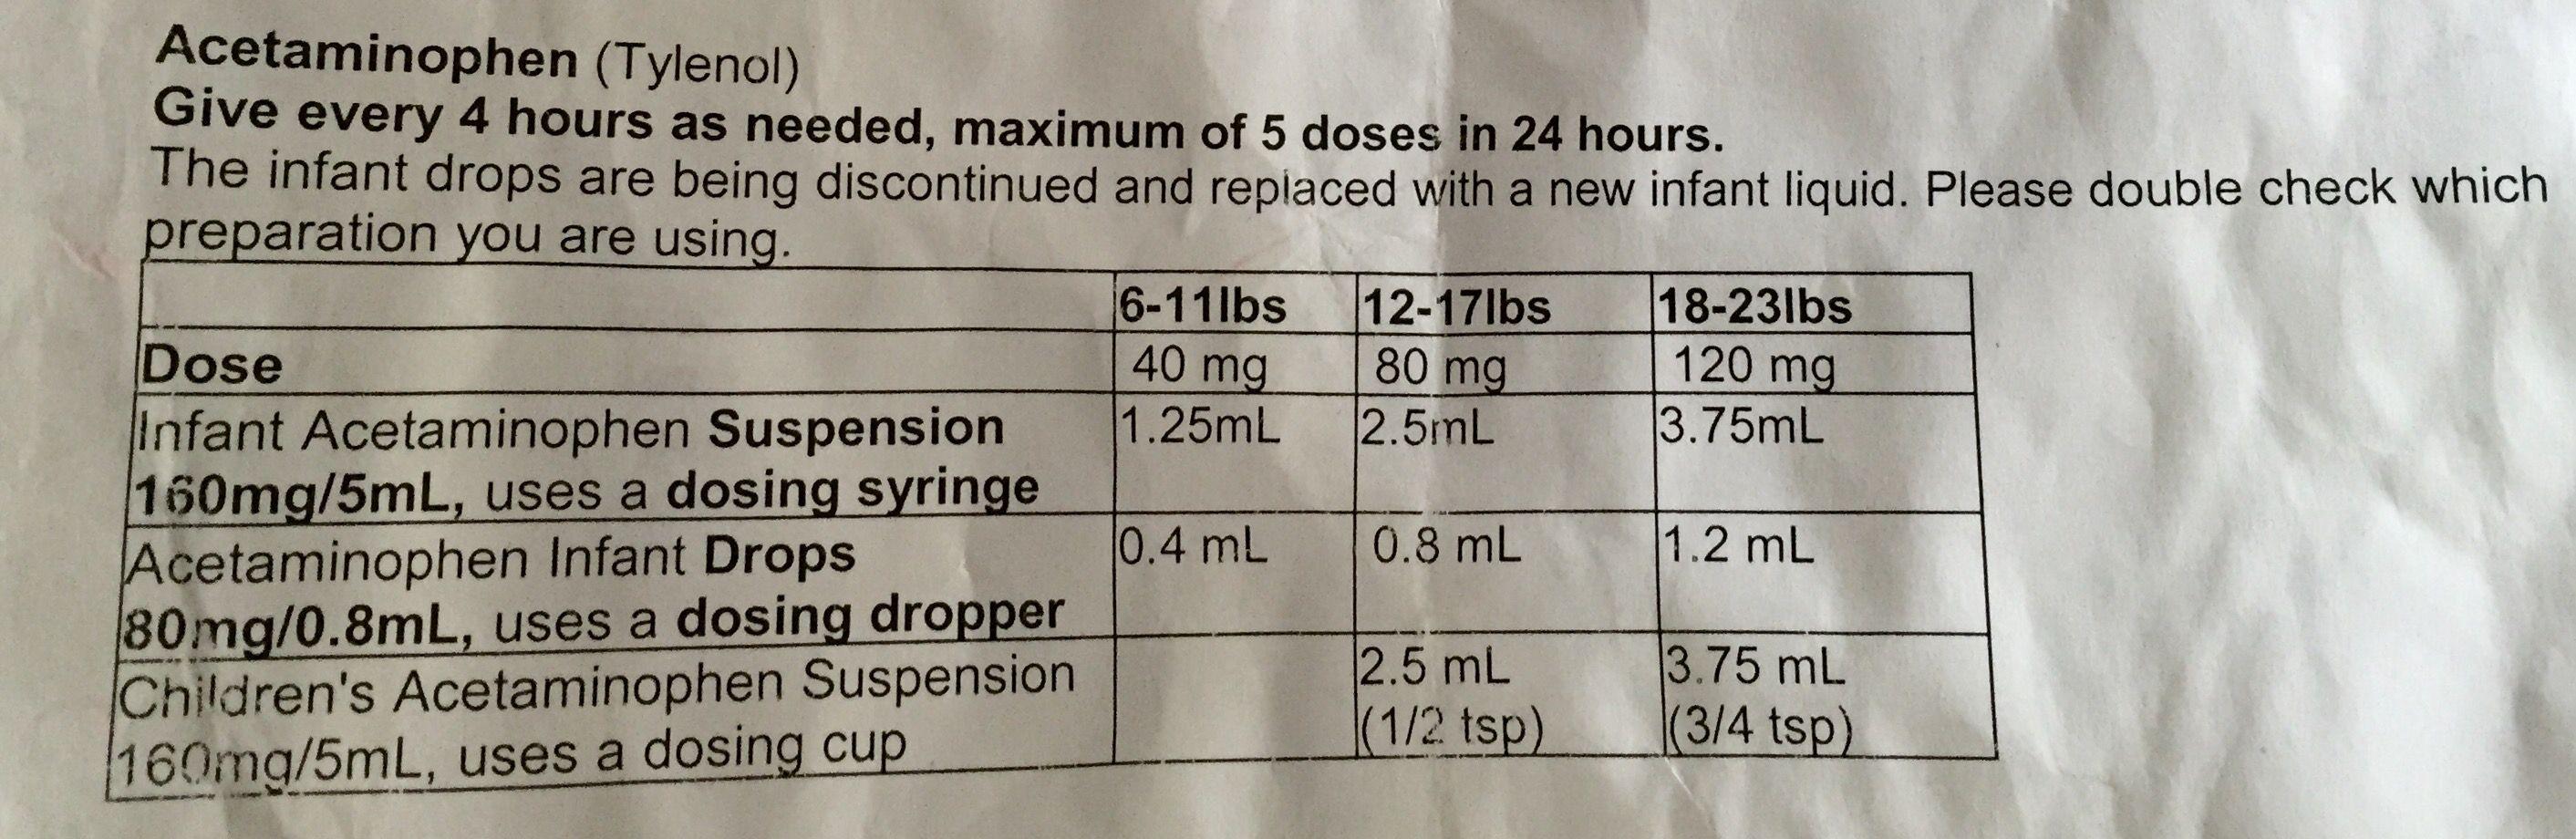 Acetaminophen infant dose chart